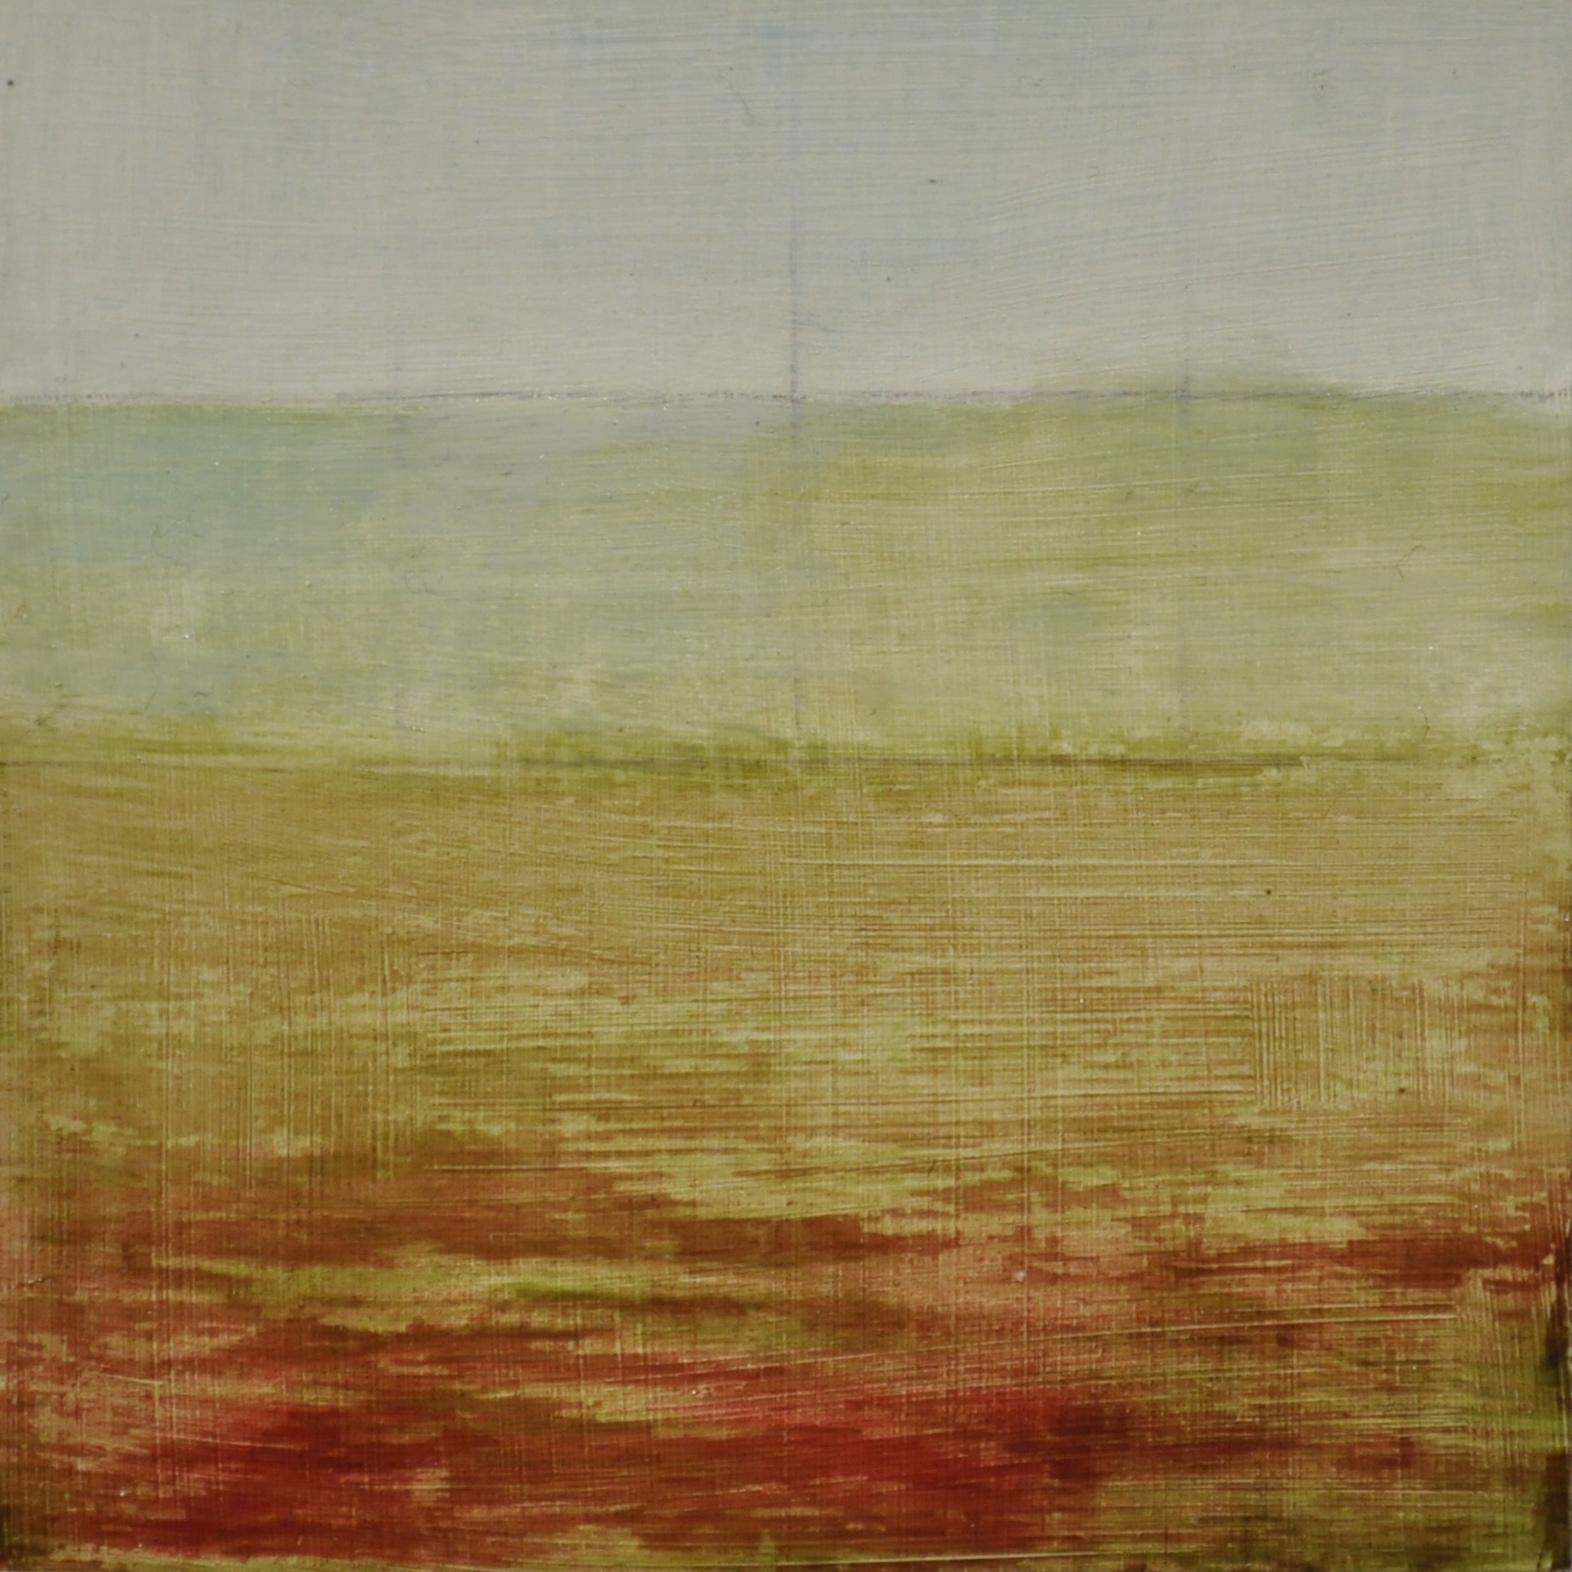 land strips, 2016  oil on wood panel, 10 x 10 cm